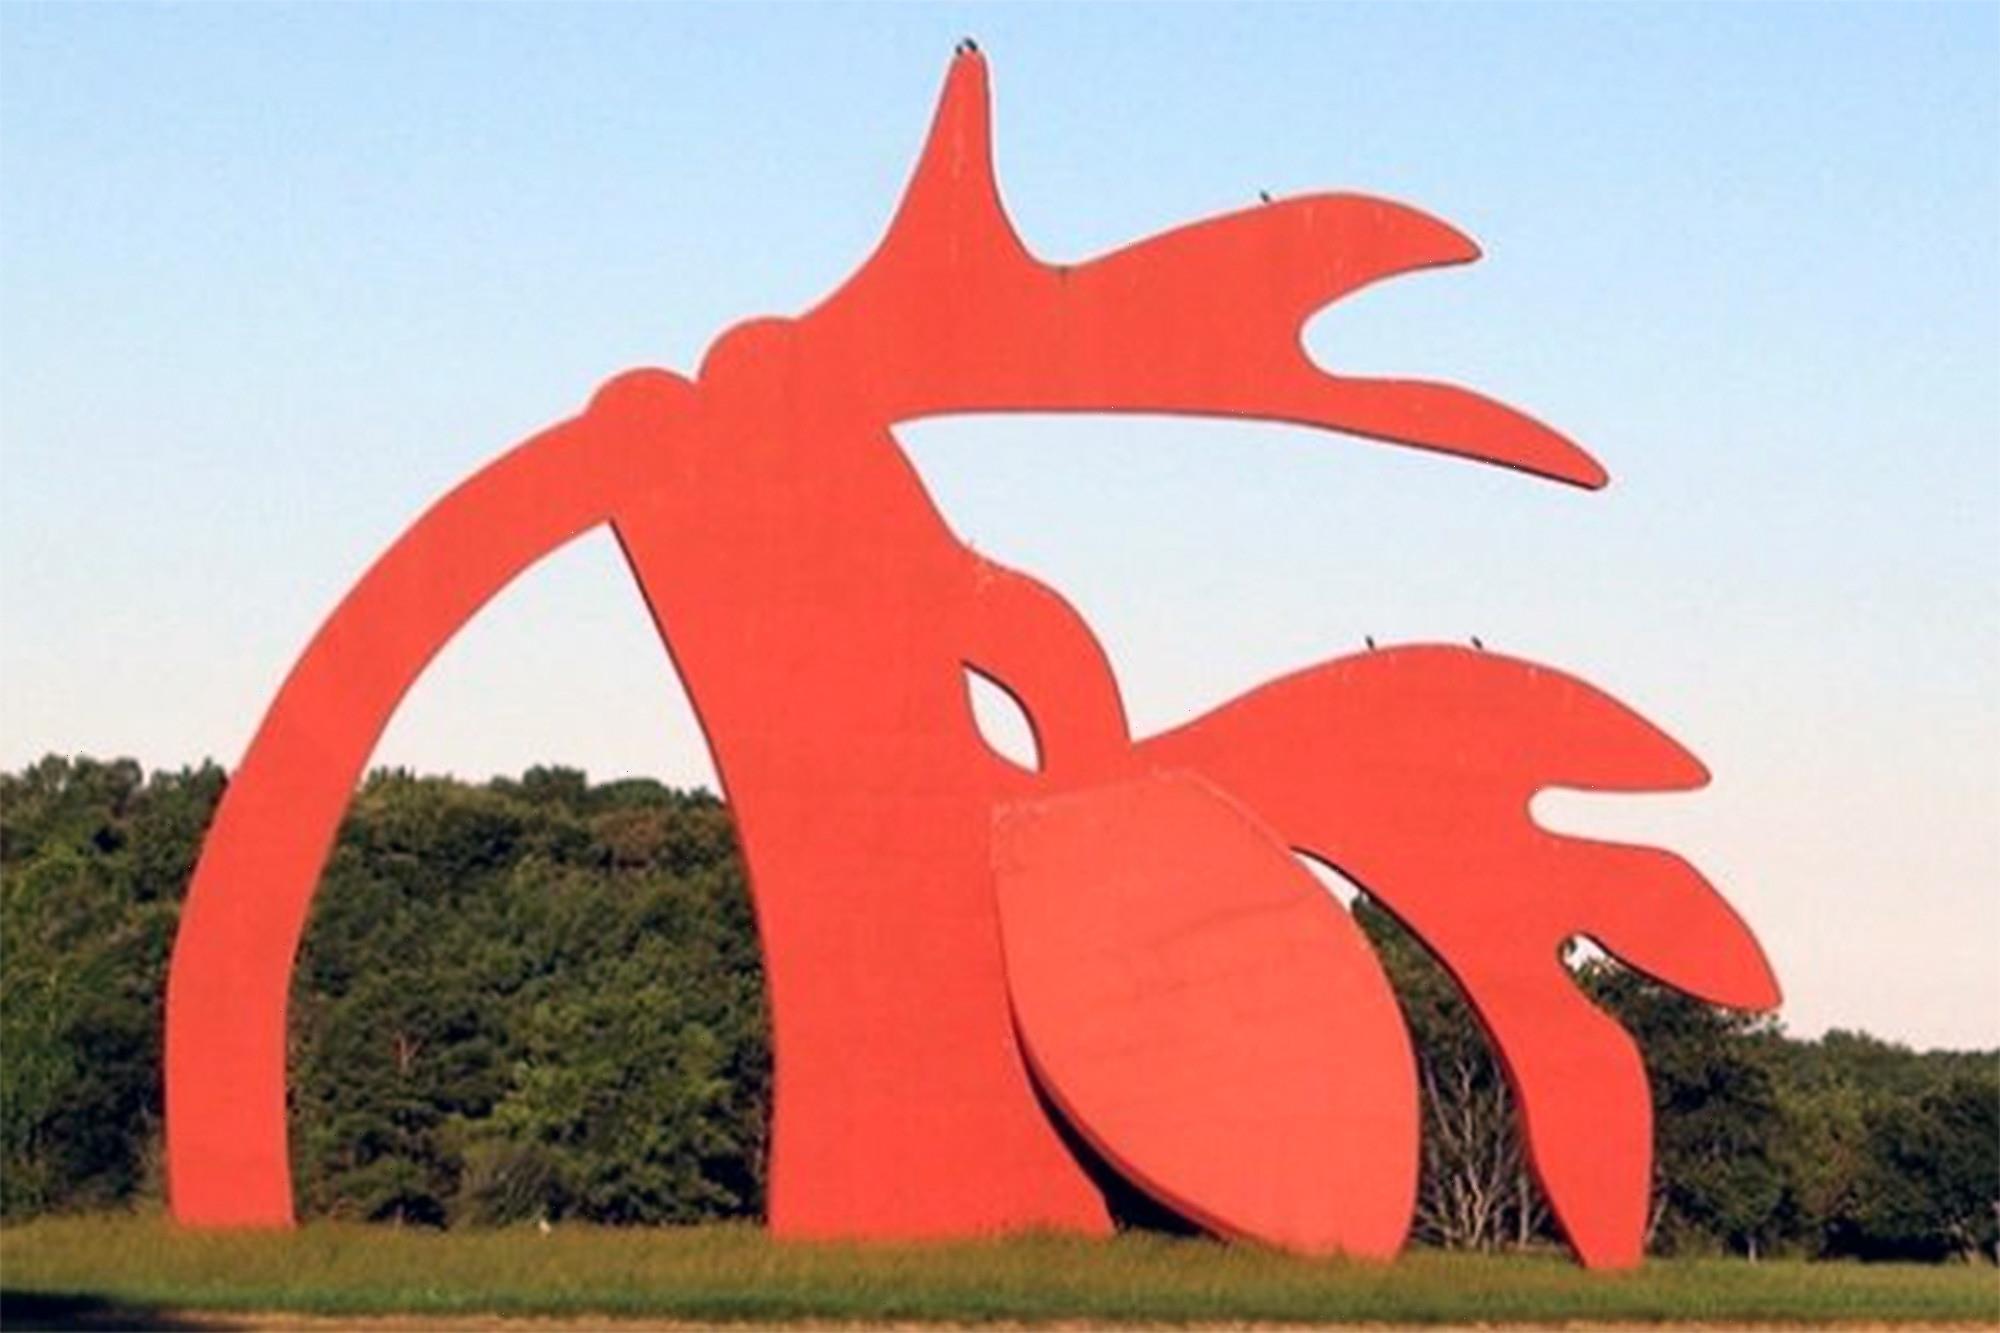 Beloved Hamptons sculpture 'Stargazer' saved by $100K donation